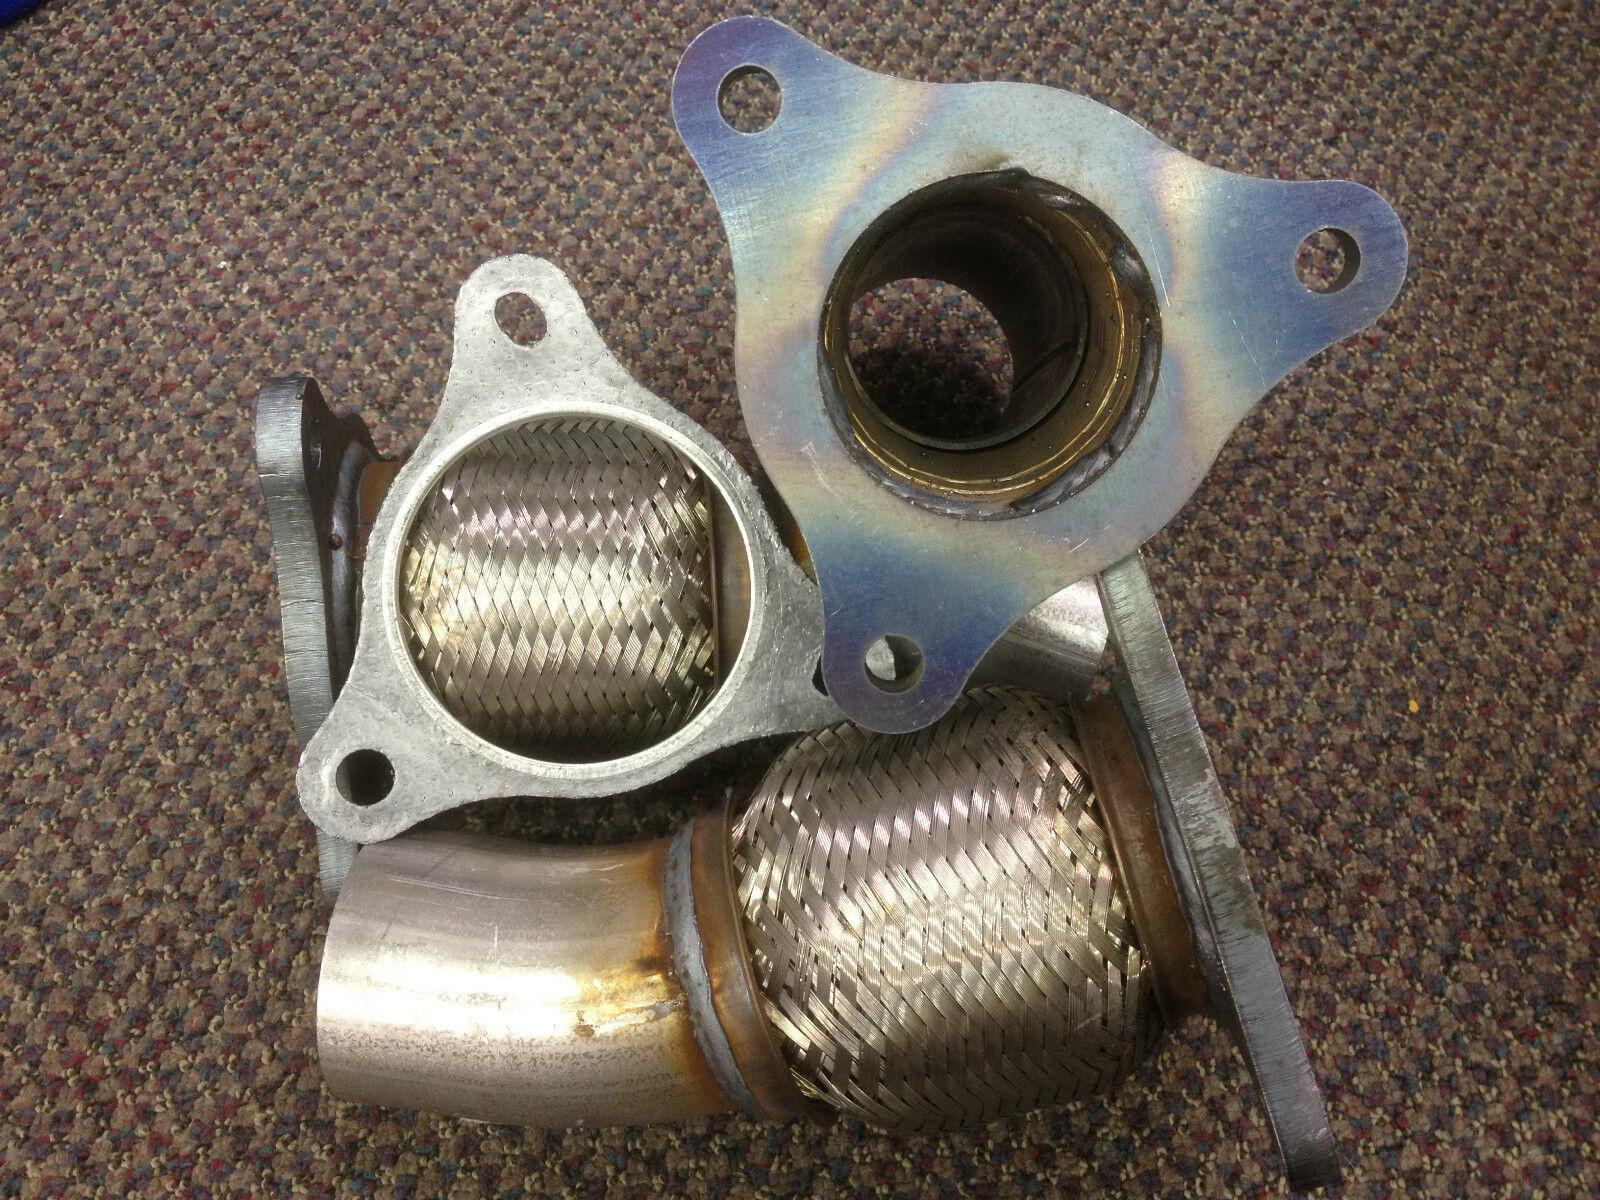 Exhaust Flange Repair Flex Pipe Replacement Chevy Cobalt Hhr Pontiac G5 Ion Vue Ebay